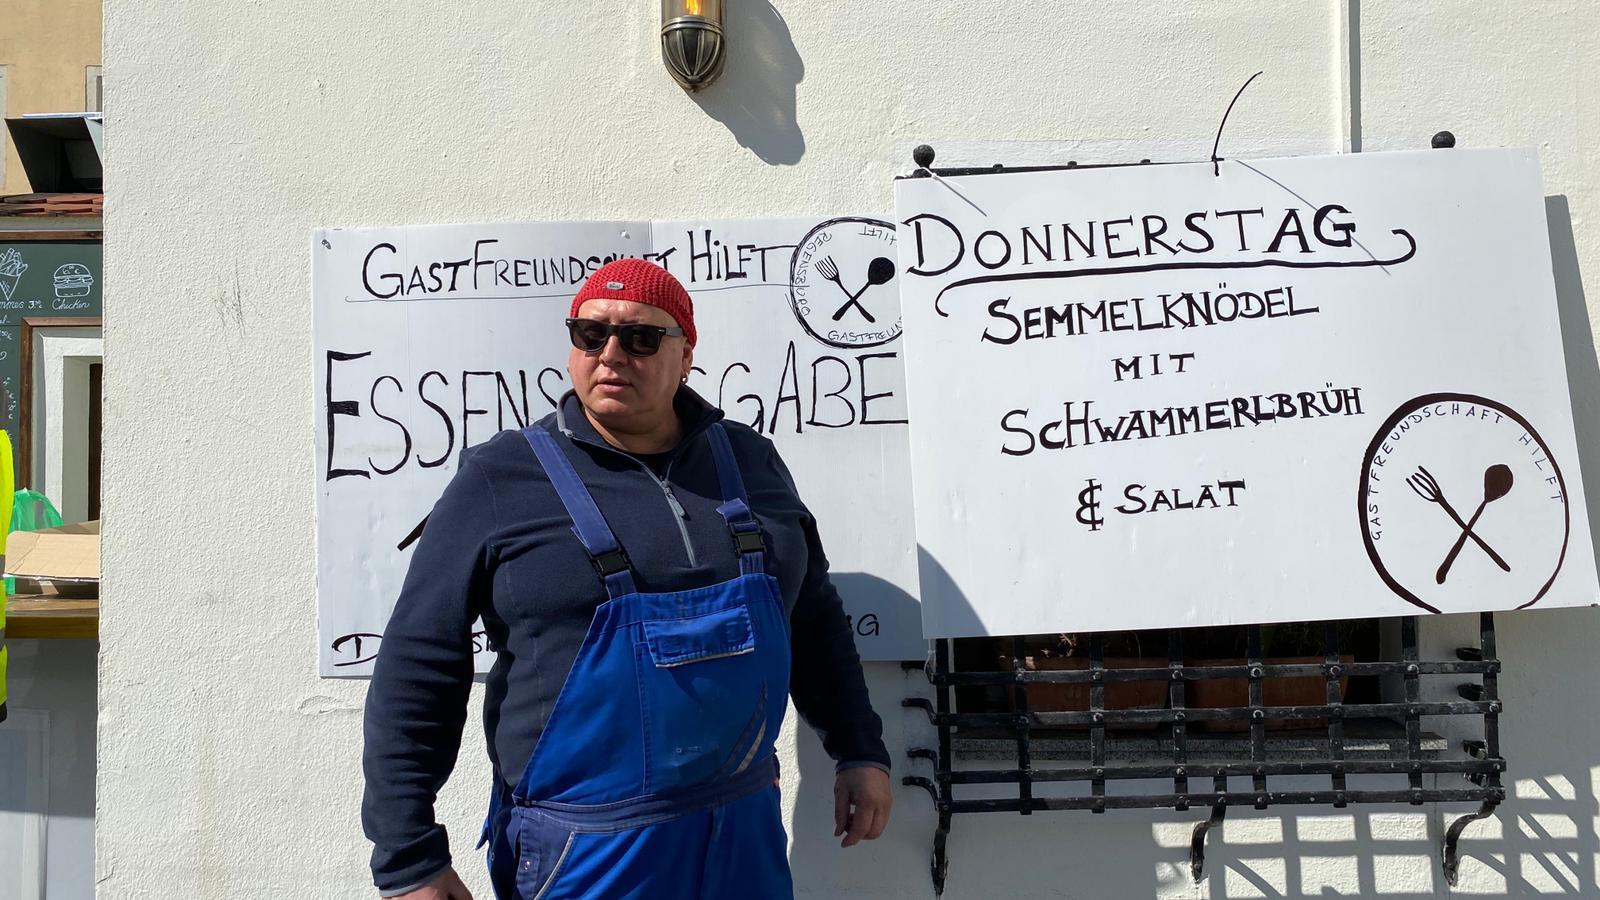 Regensburg Hilft